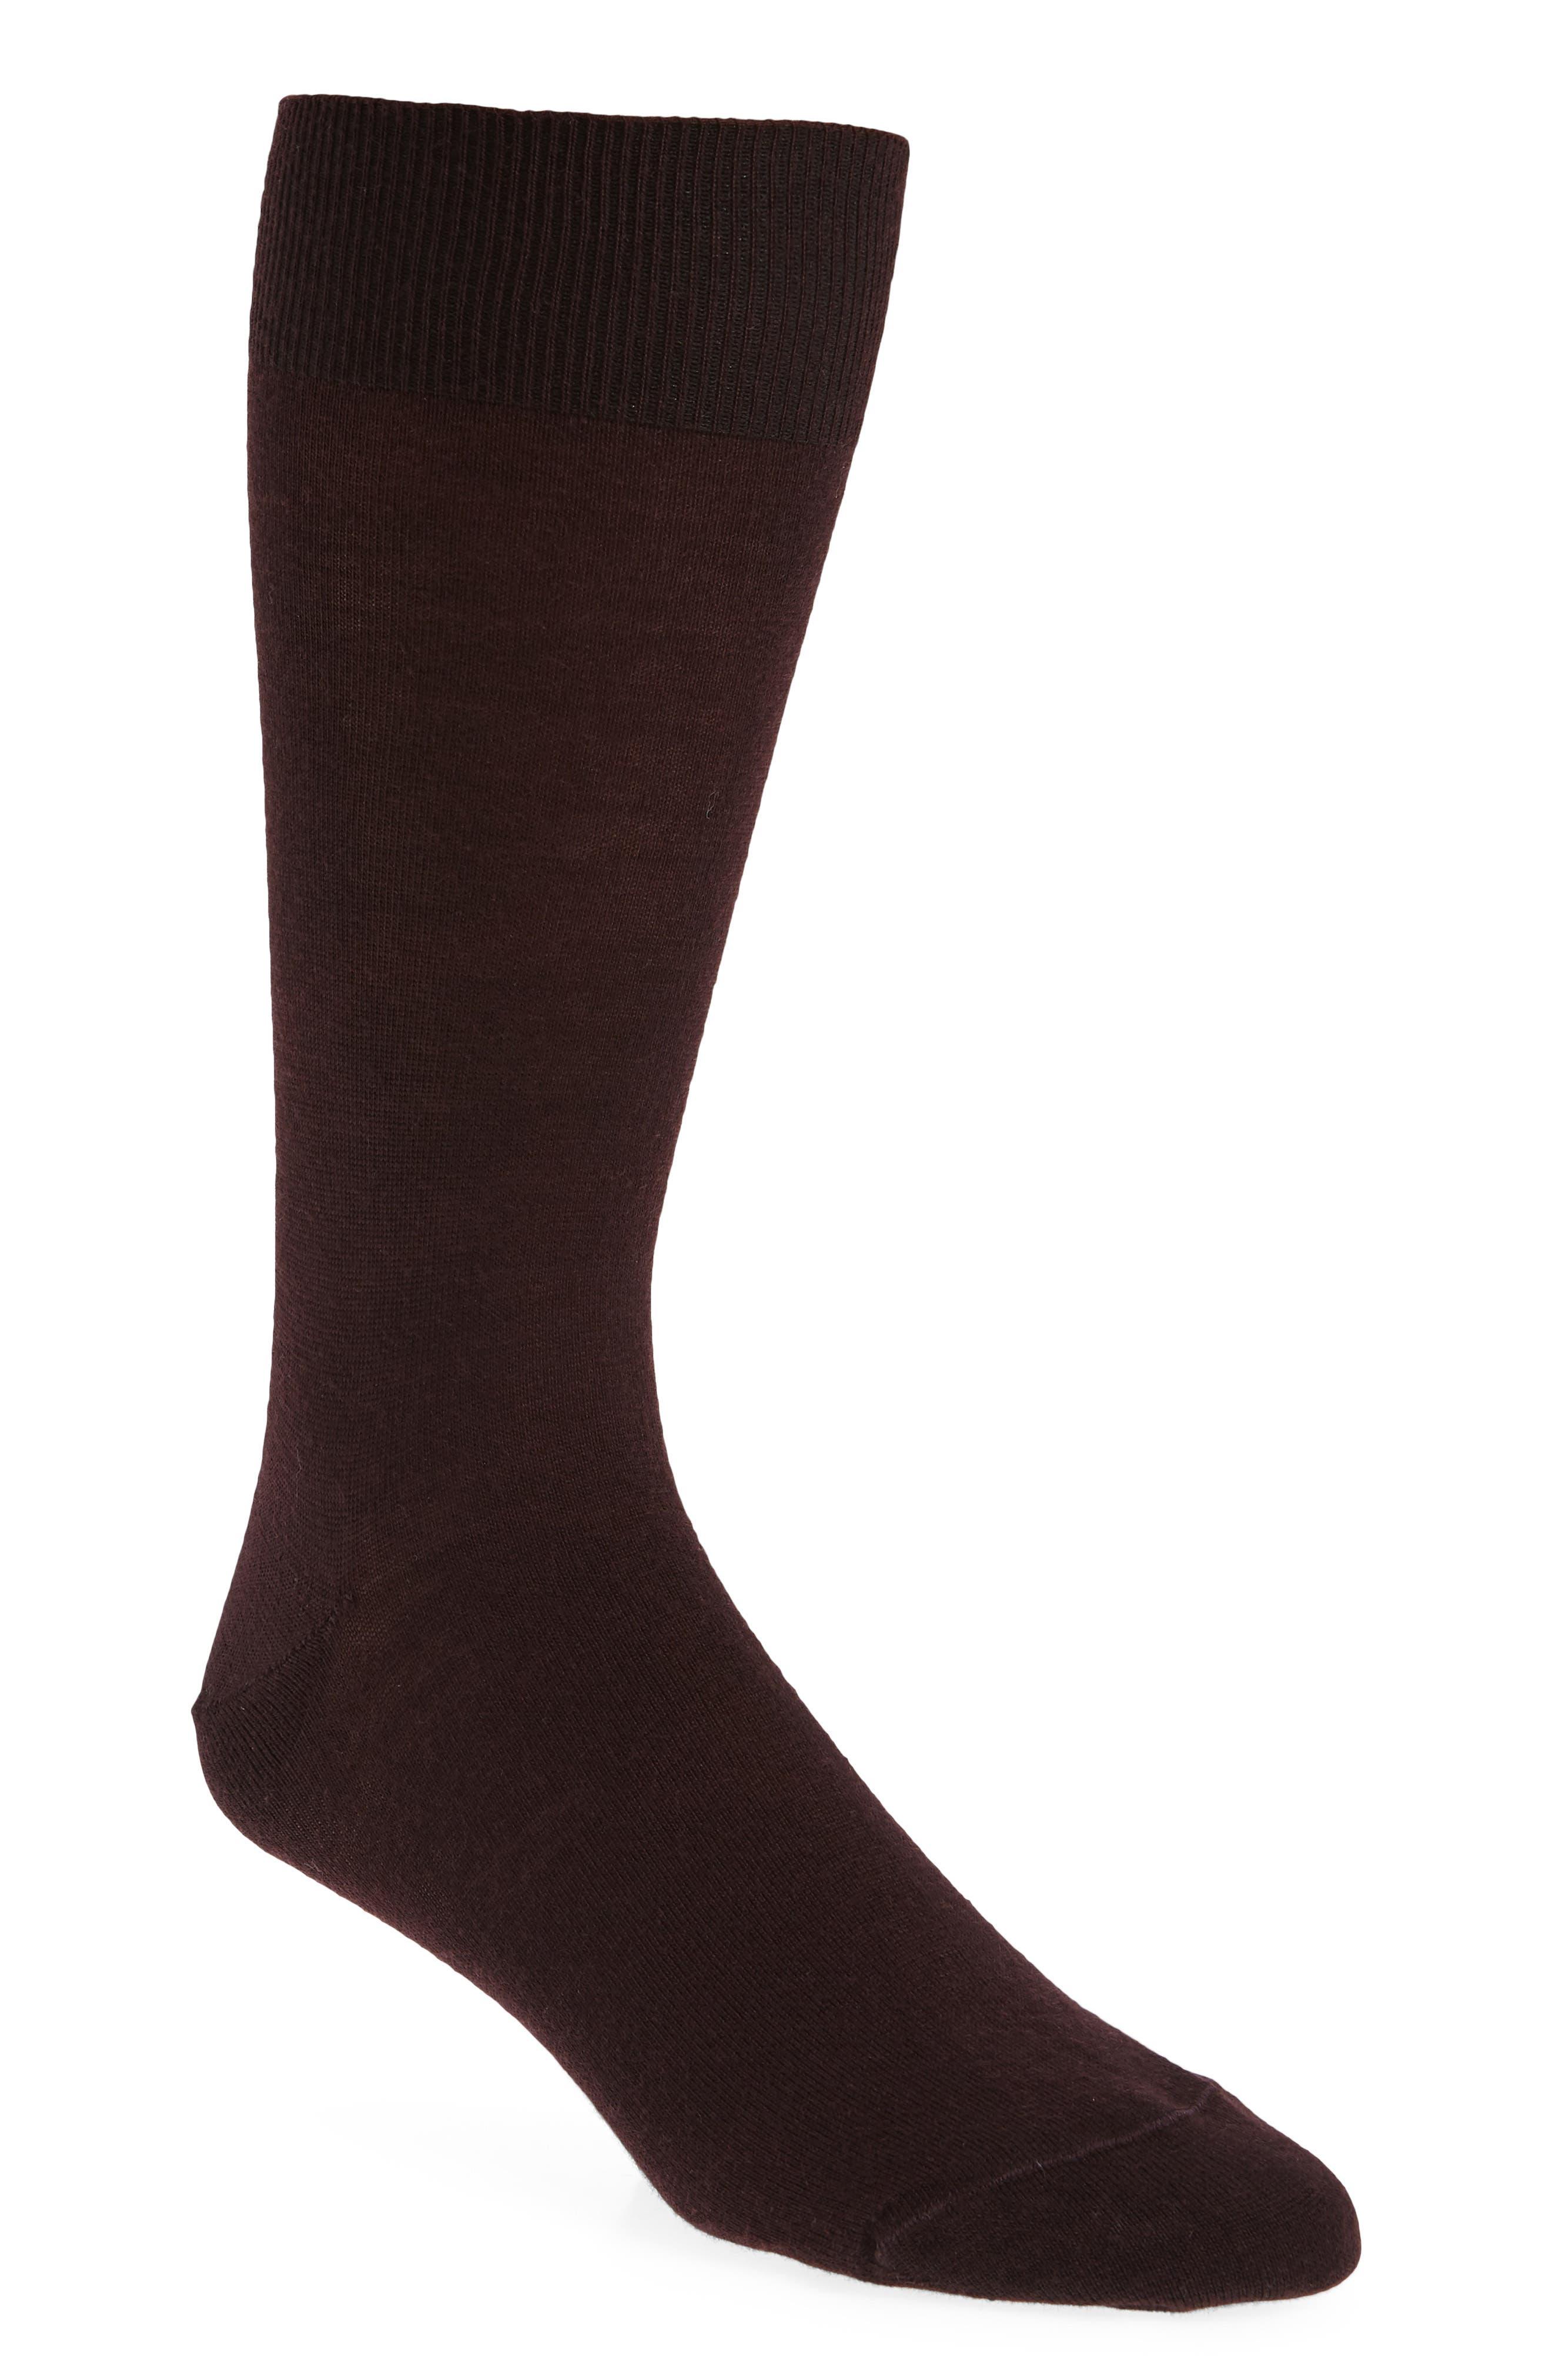 Slack Socks,                             Main thumbnail 1, color,                             BURGUNDY STEM